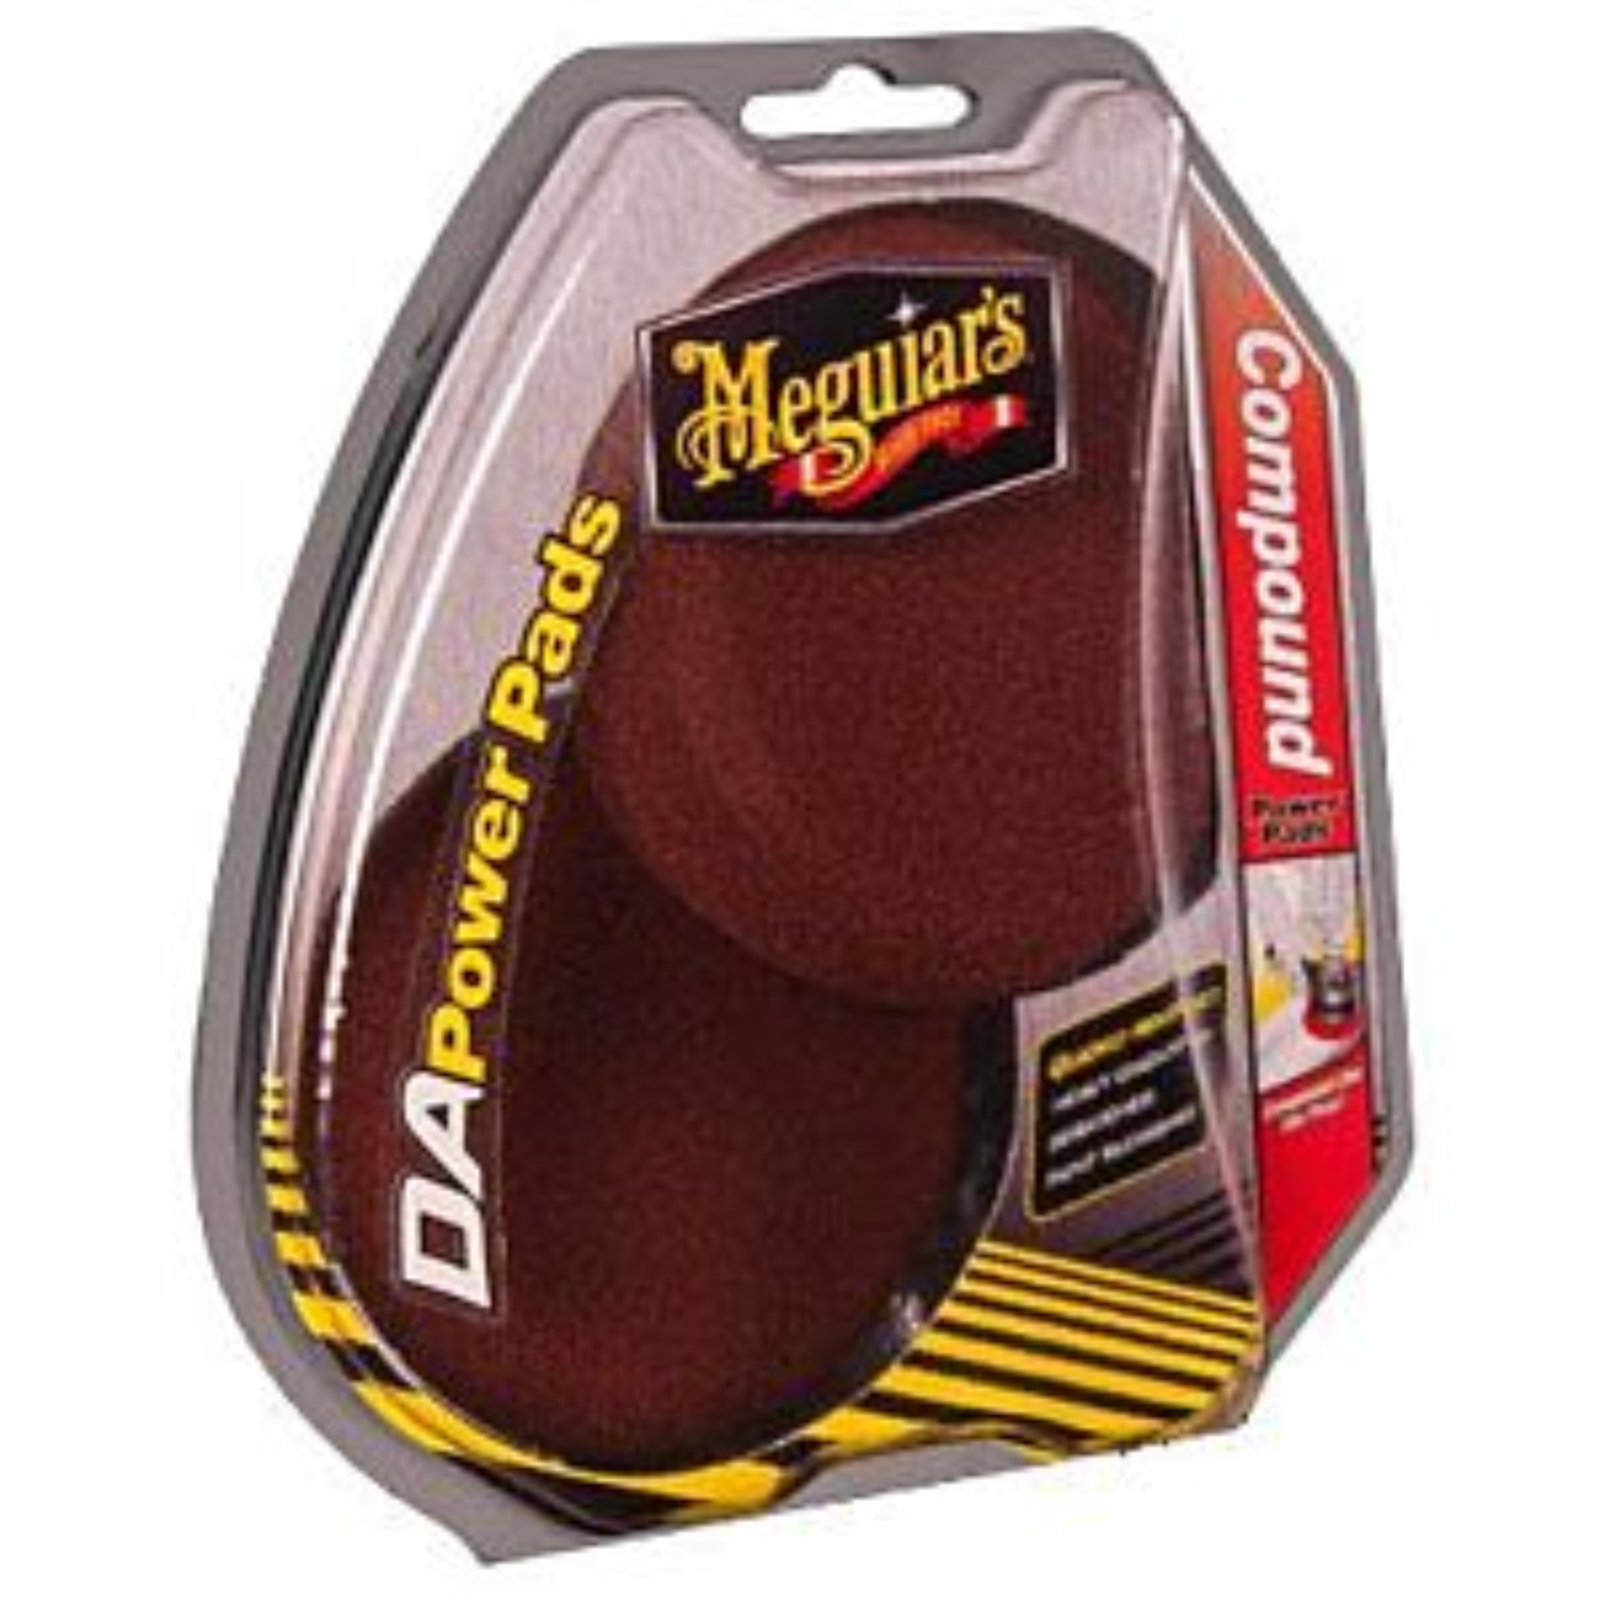 MEGUIAR'S DA COMPOUND POWER PADS (G3507)